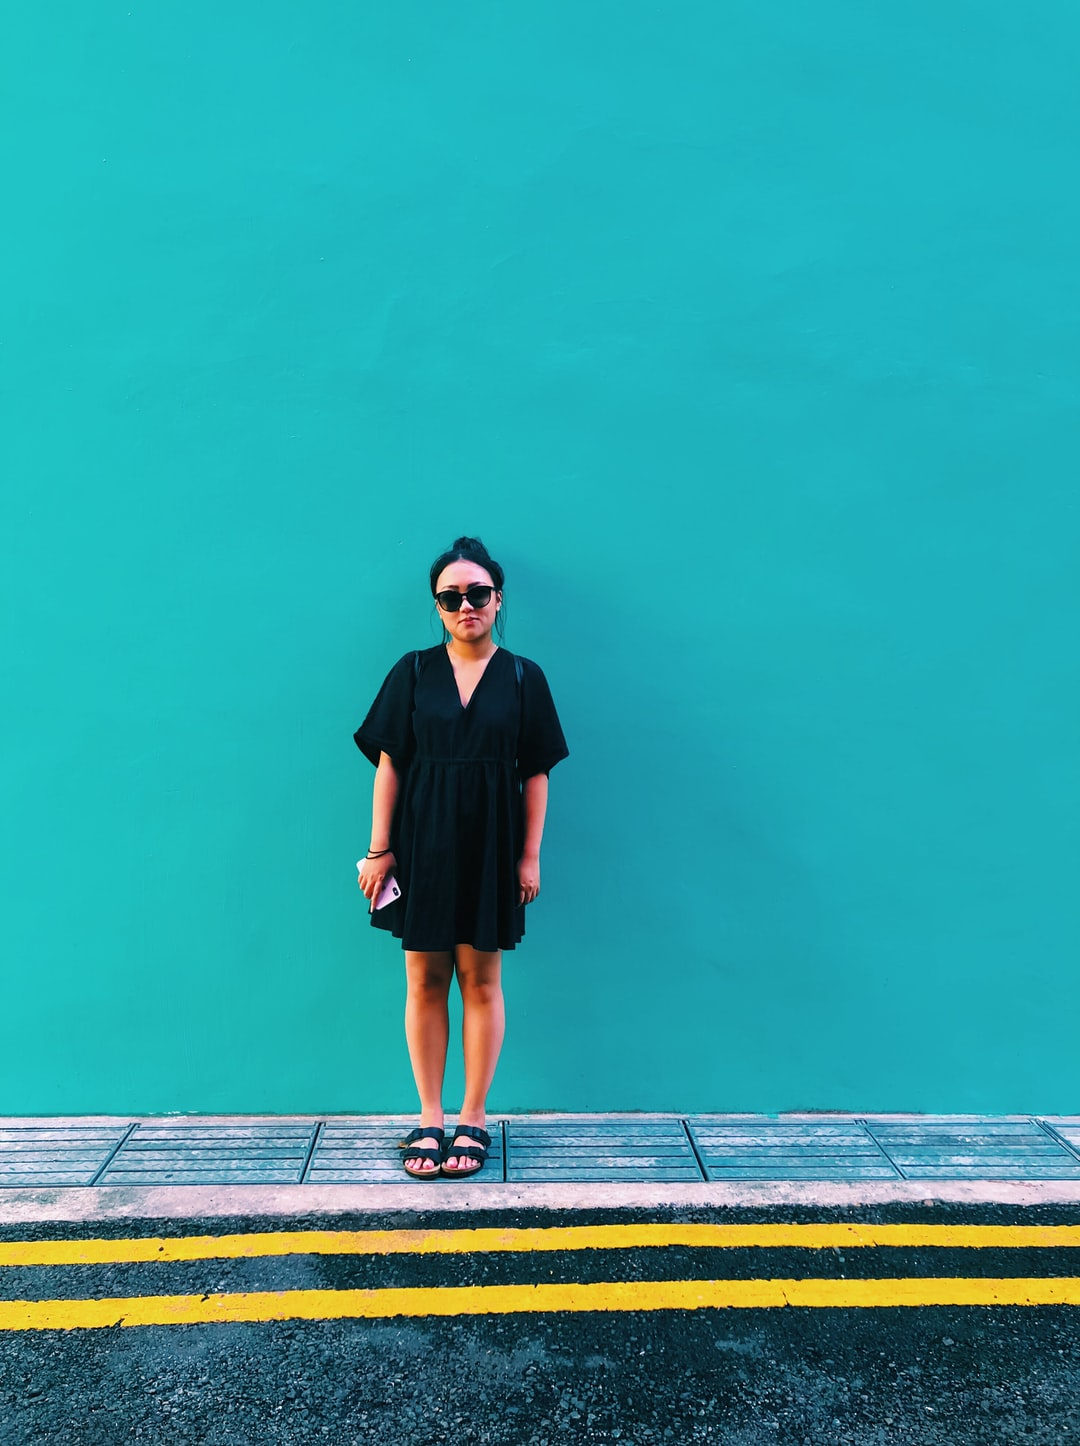 Teresa Nguyen, Graphic Designer. Visit behance.net/cullandnguyen for more of our work.